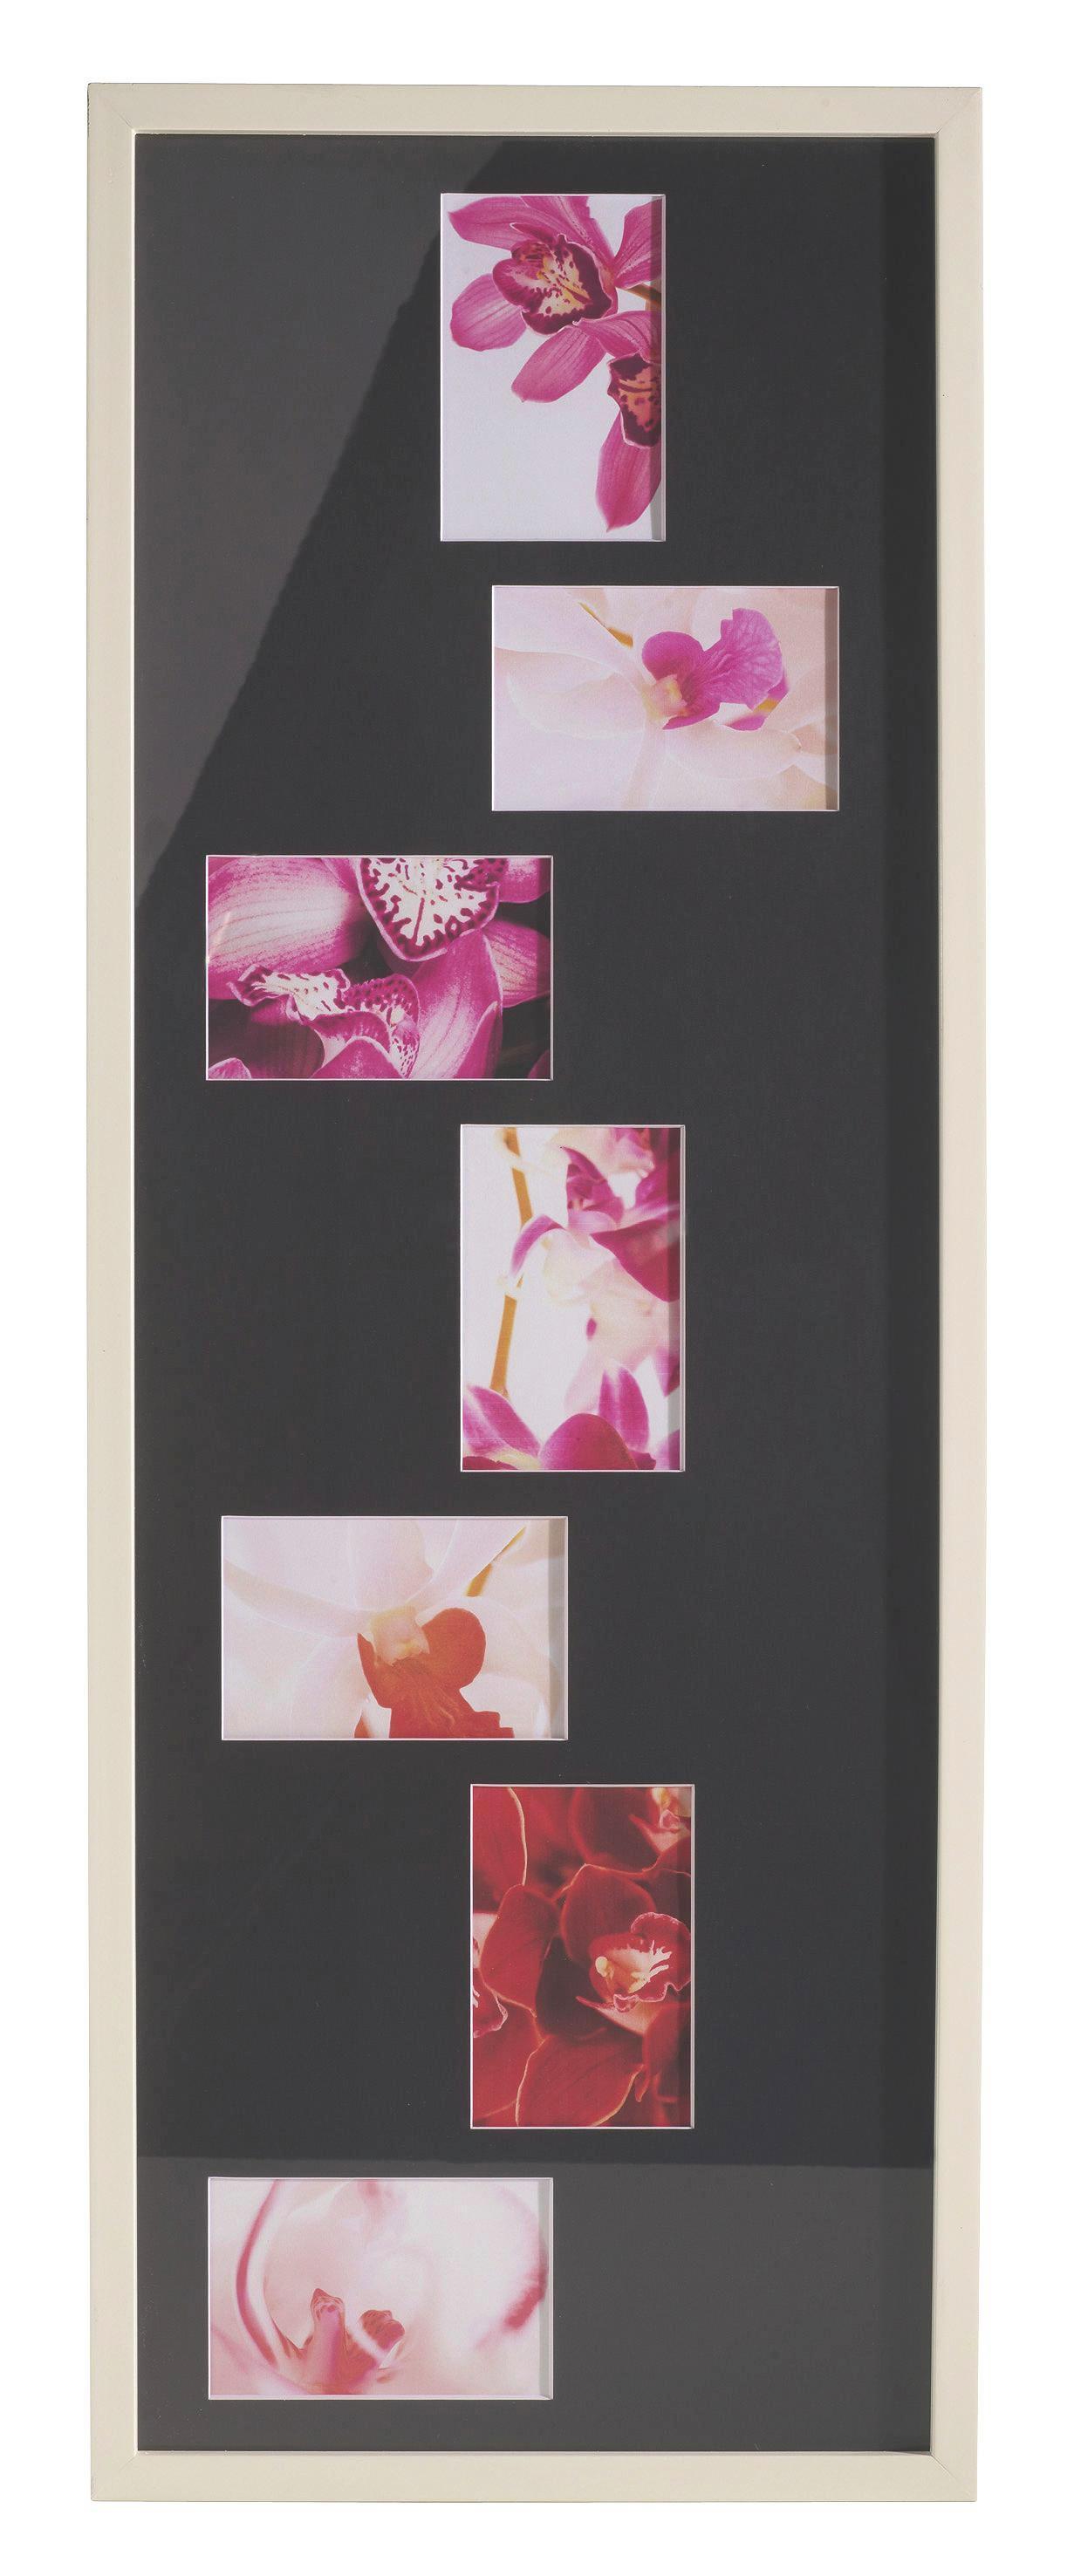 Okvir Za Slike Reiner - črna/bela, Konvencionalno, steklo/les (36,2/98,4/4cm) - MÖMAX modern living